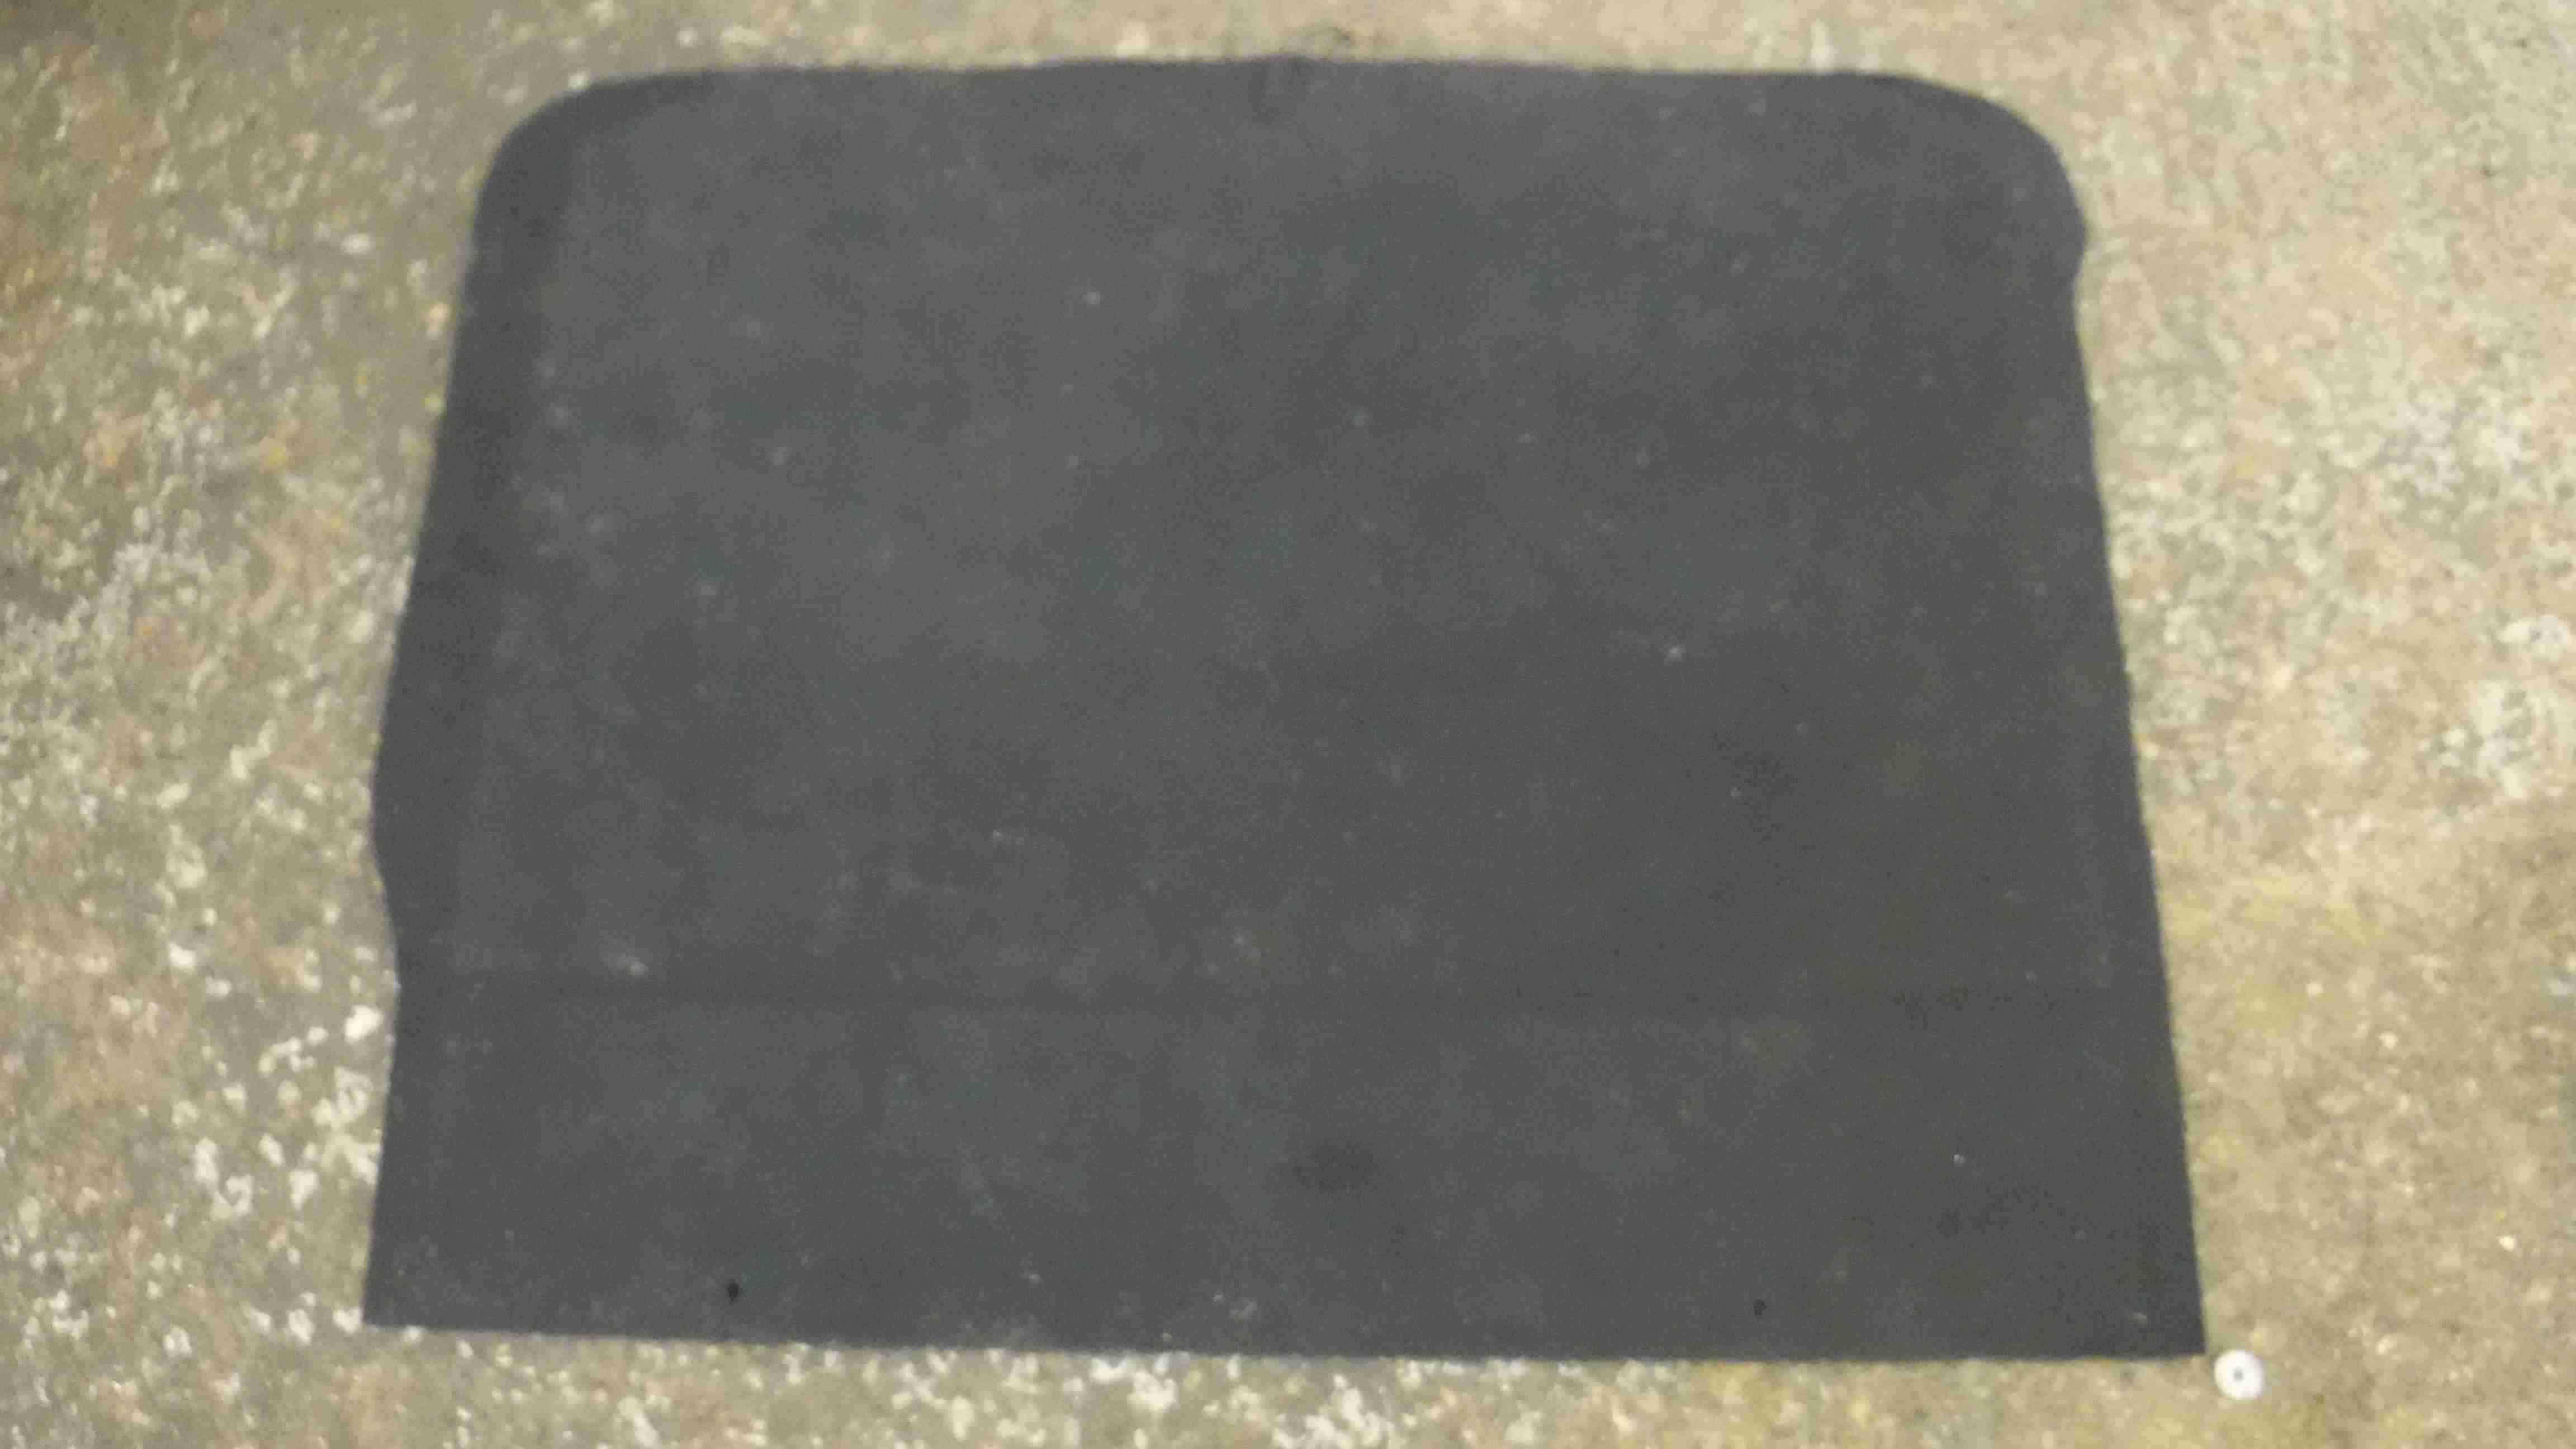 Renault Scenic 2003-2009 Black Boot Carpet Floor Mat Liner 8200250345